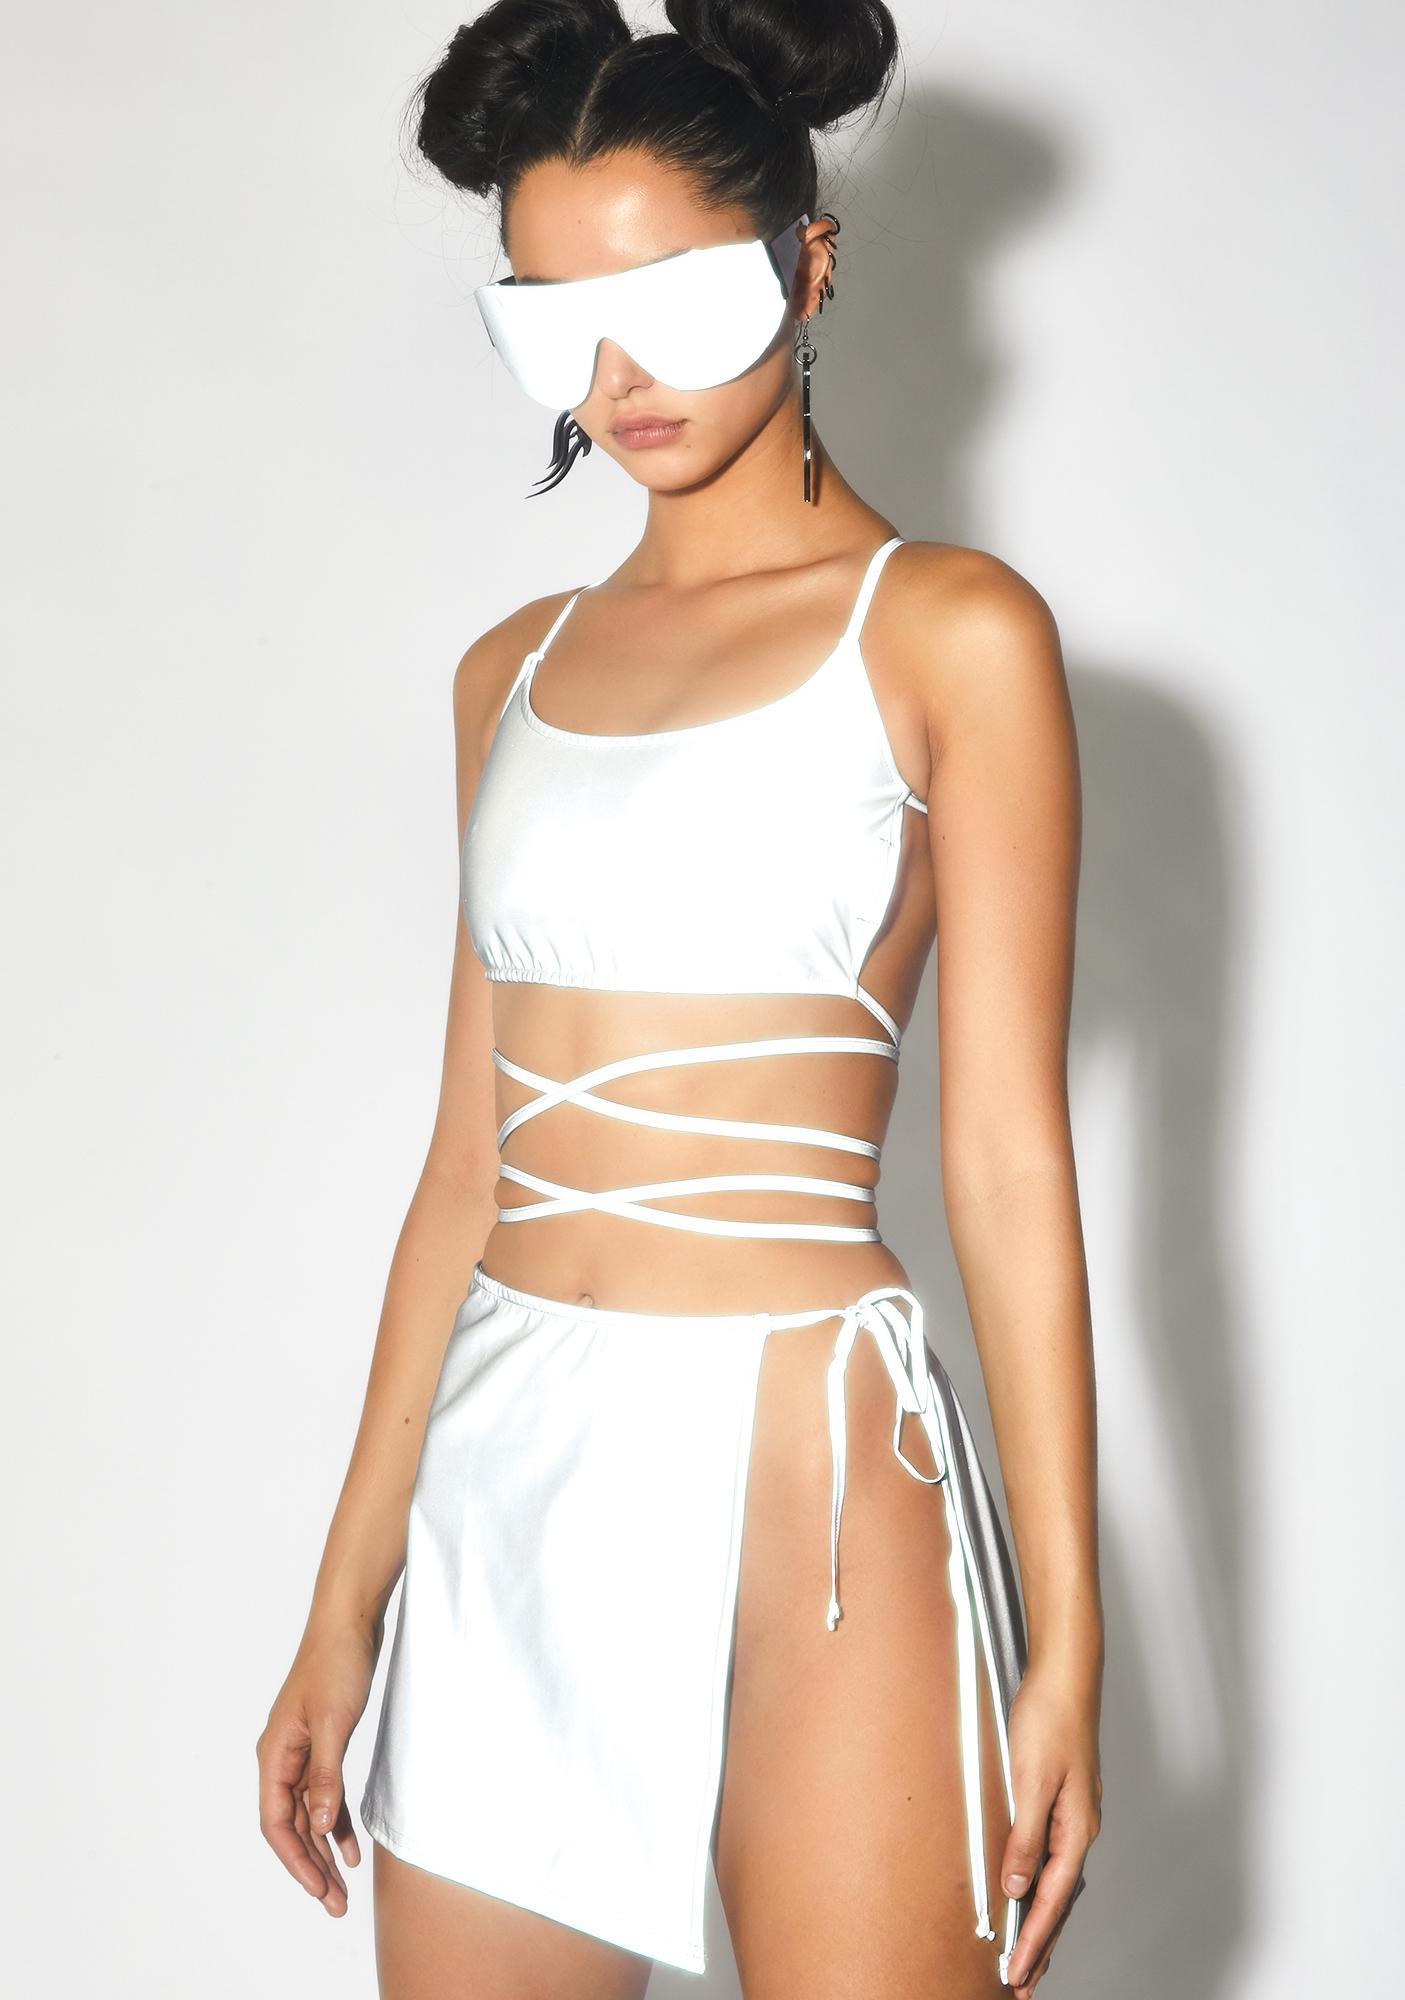 Club Exx Beta Breaker Reflective Wrap Skirt